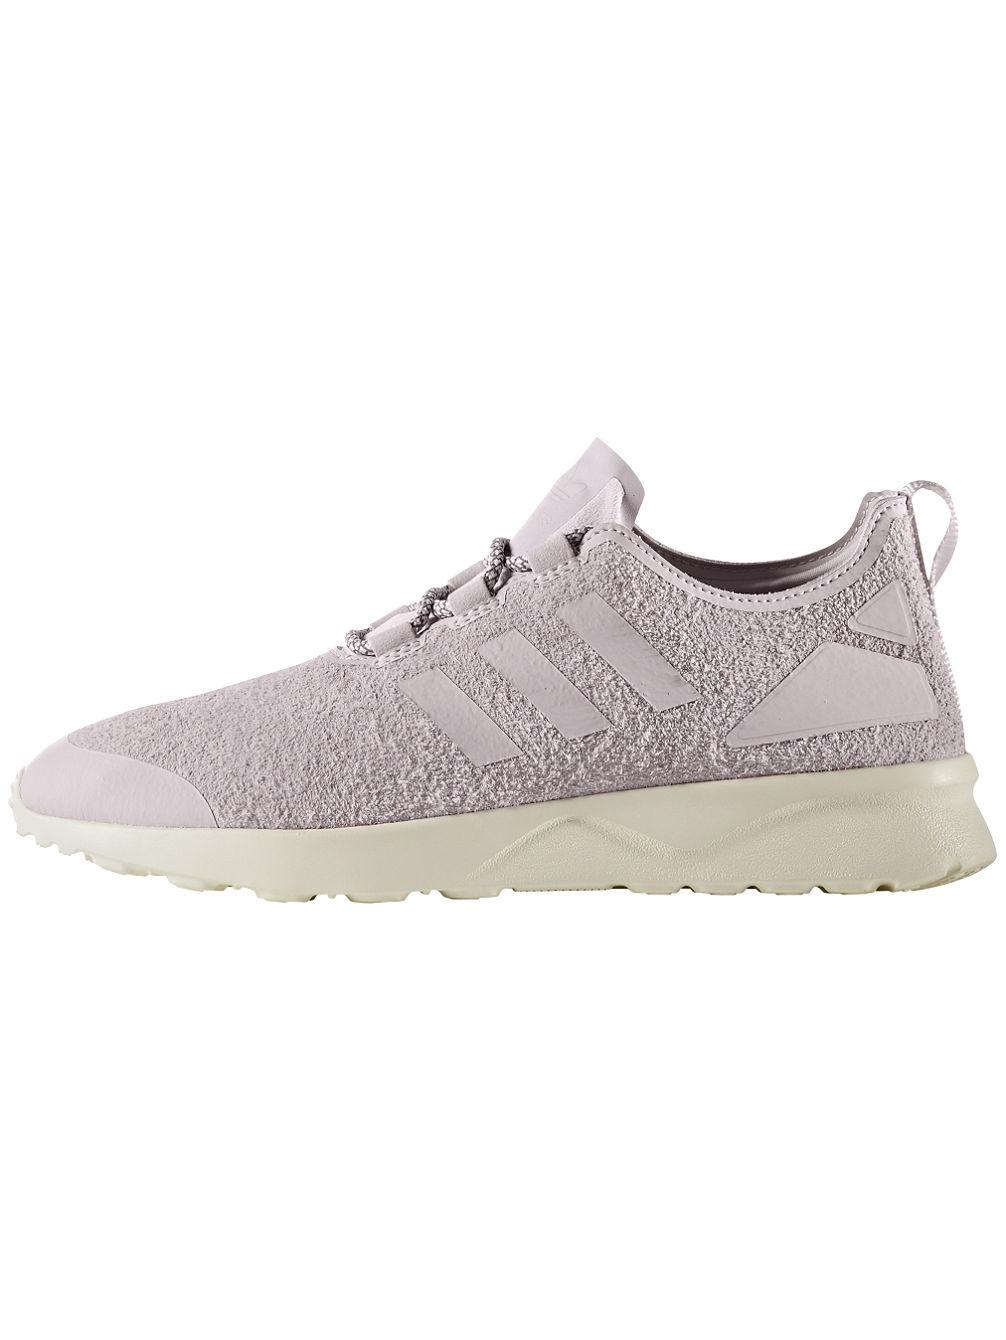 adidas-originals-zx-flux-adv-verve-sneakers